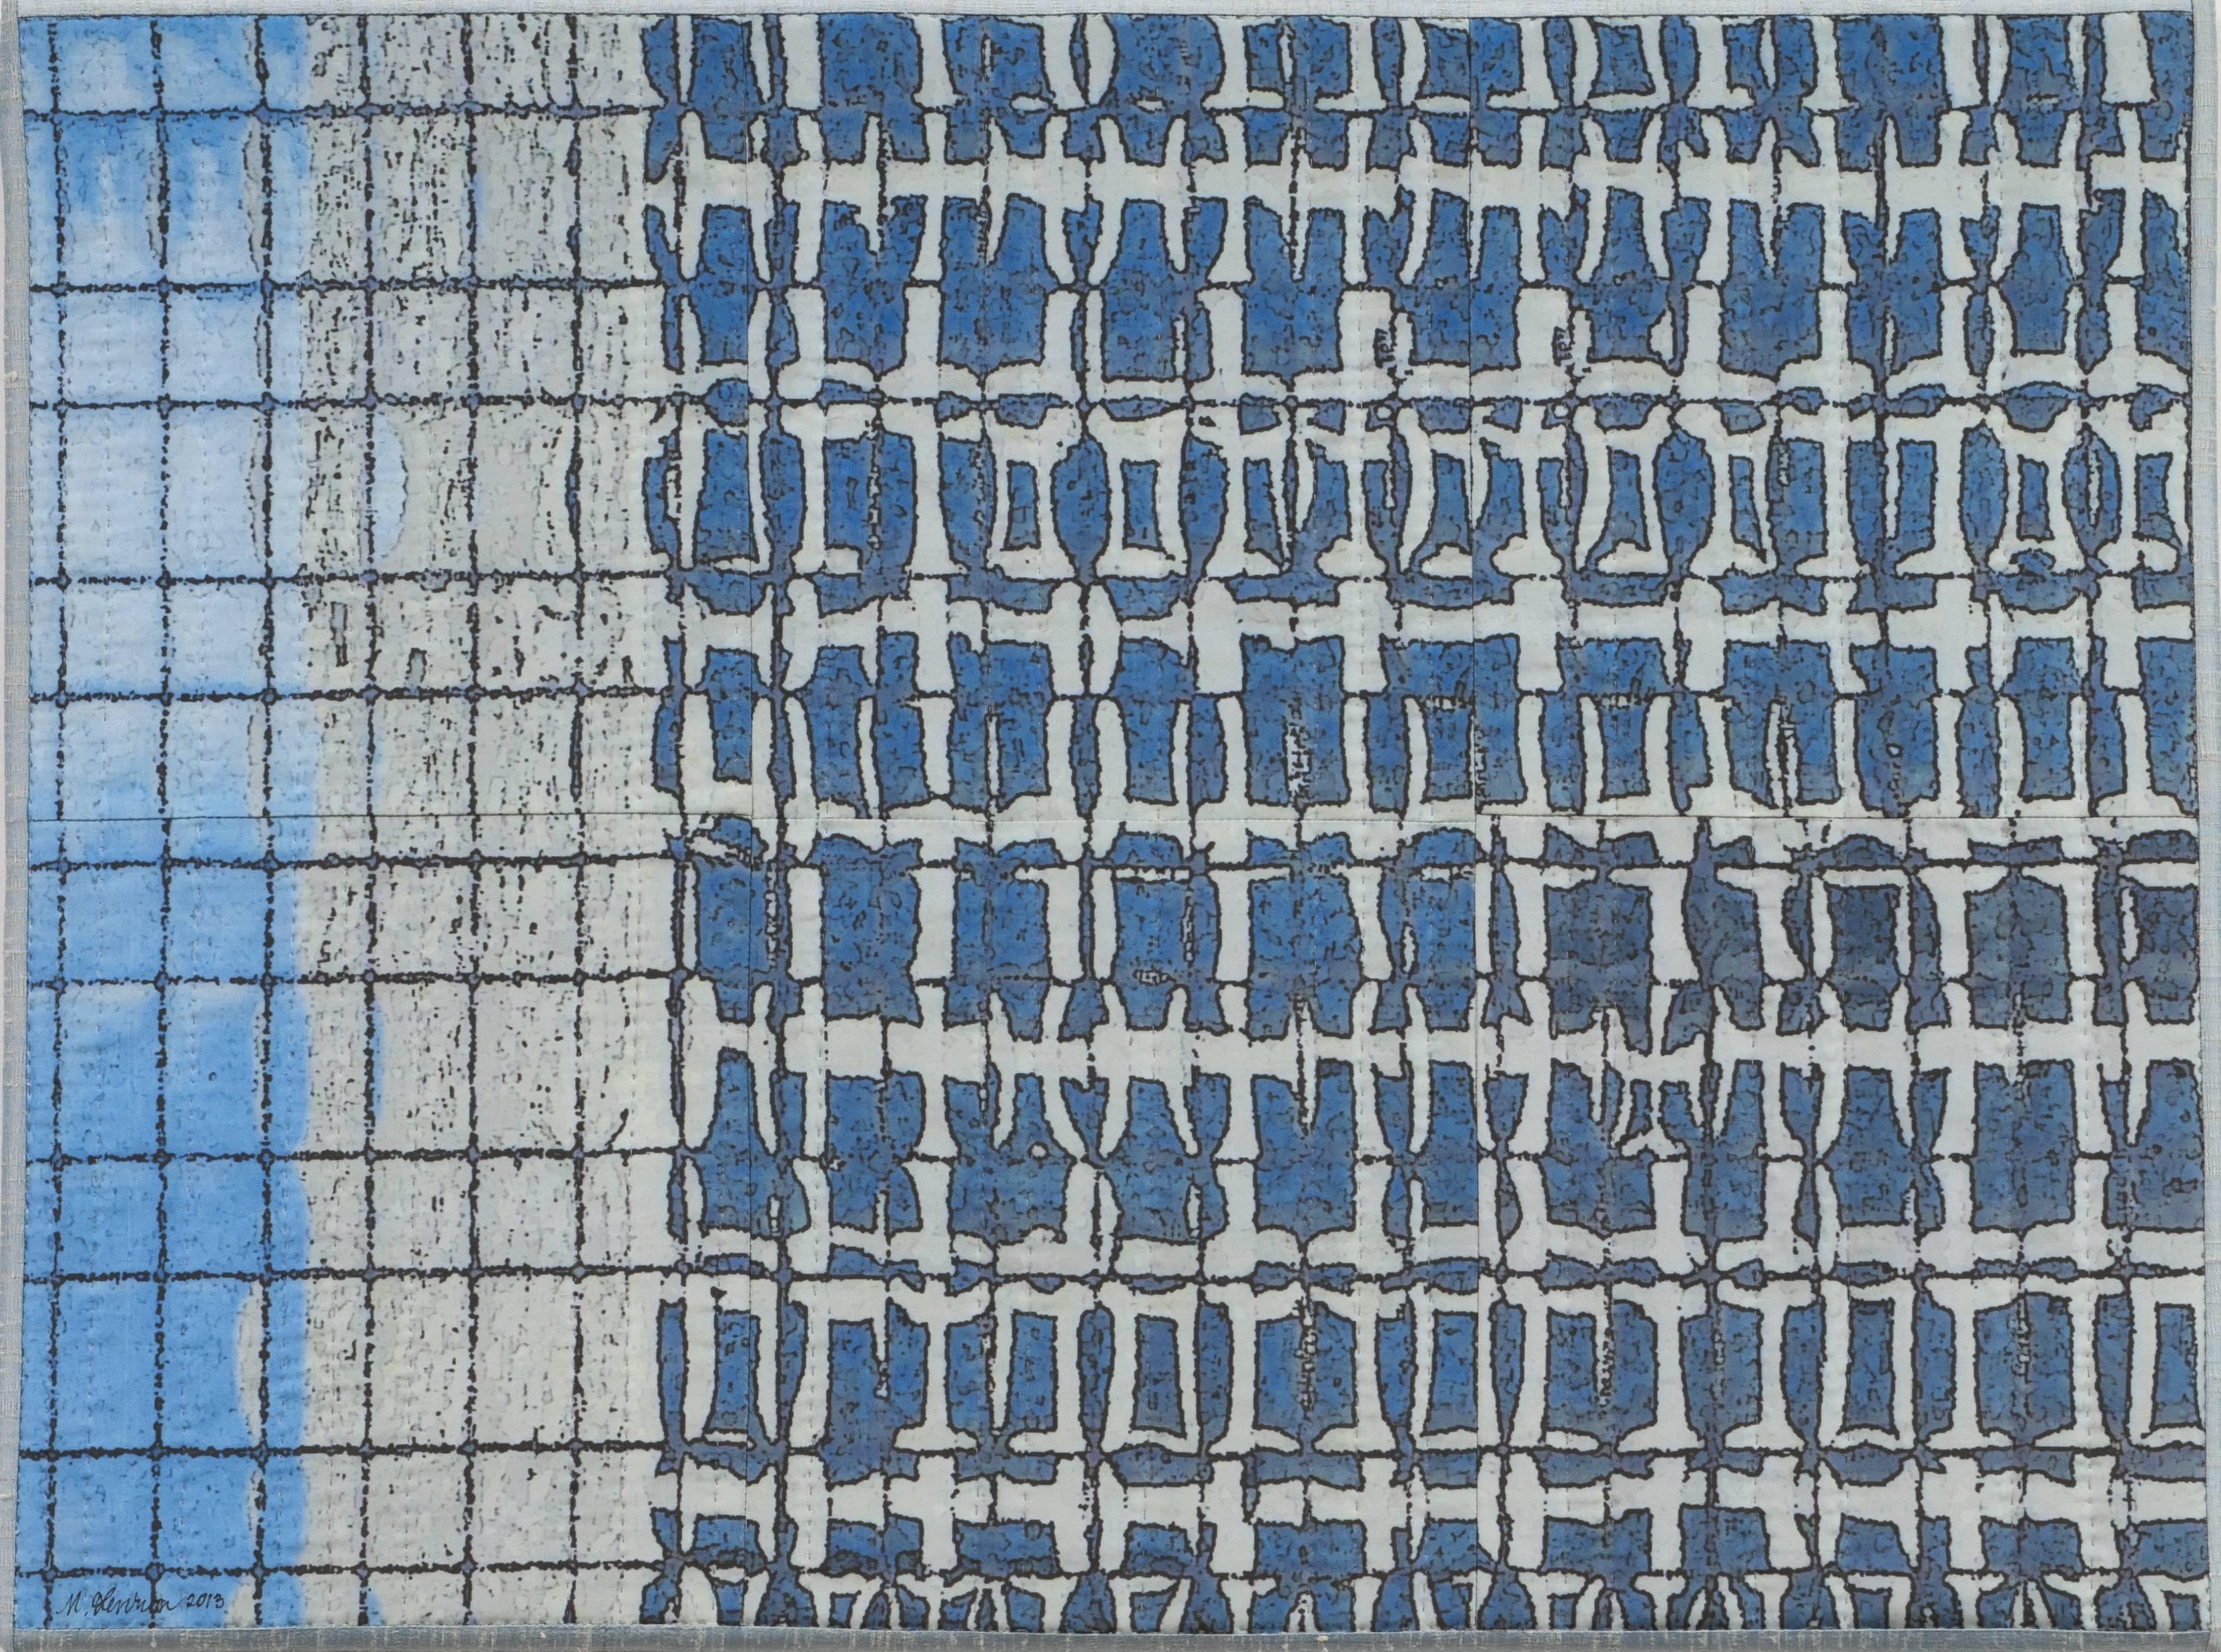 Chicago Windows 1303, Mixed Media on Canvas